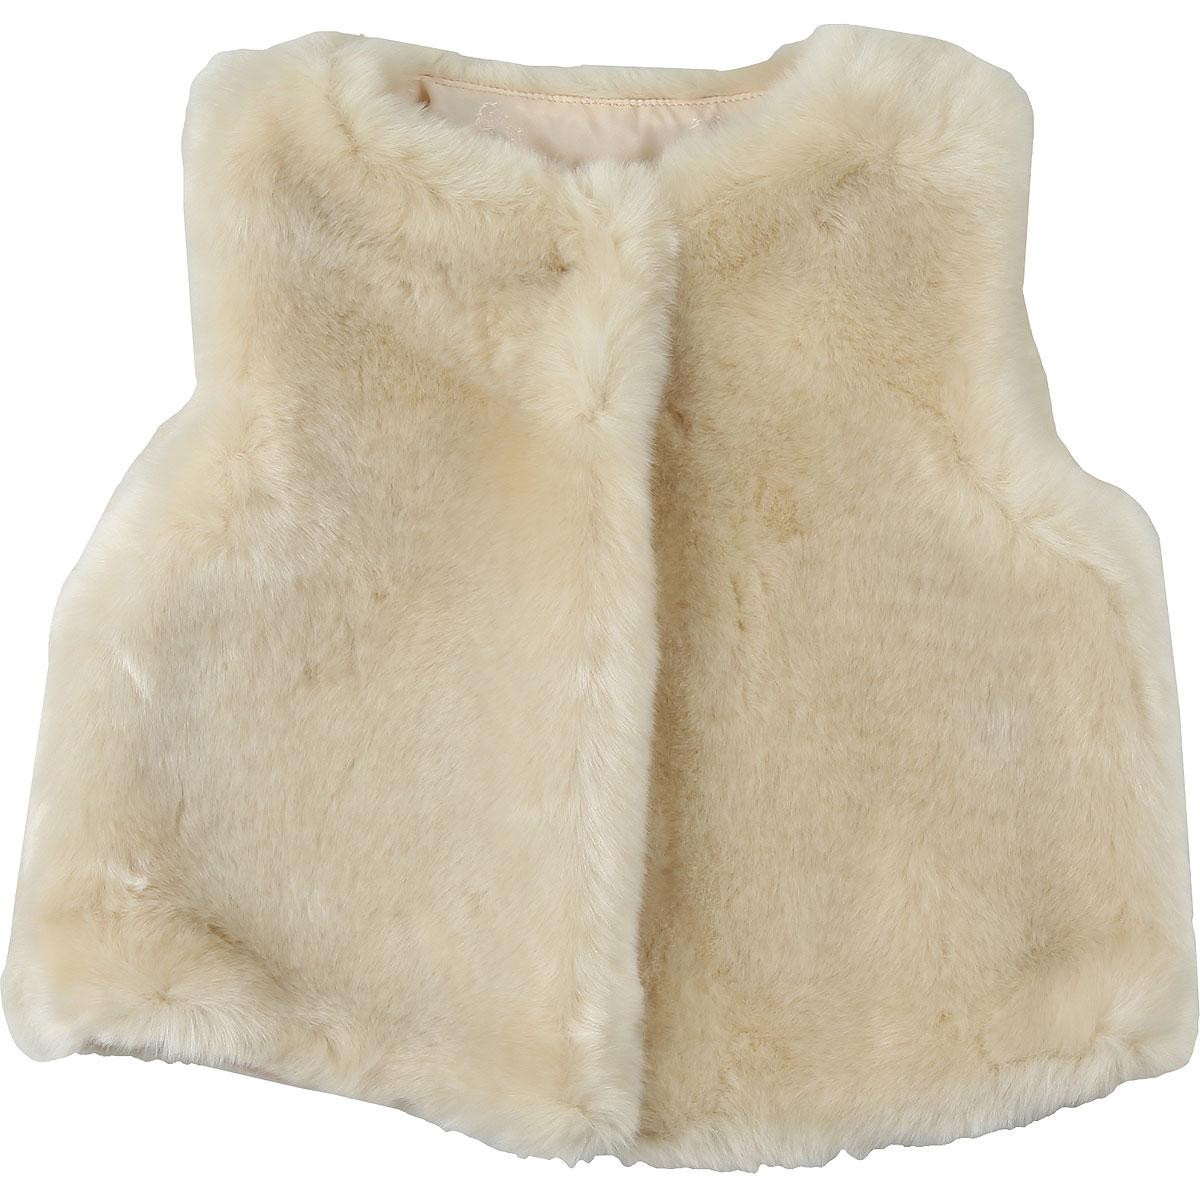 Chloe Baby Coats for Girls On Sale, Ivory, Acrylic, 2019, 12M 18M 2Y 3Y 9M